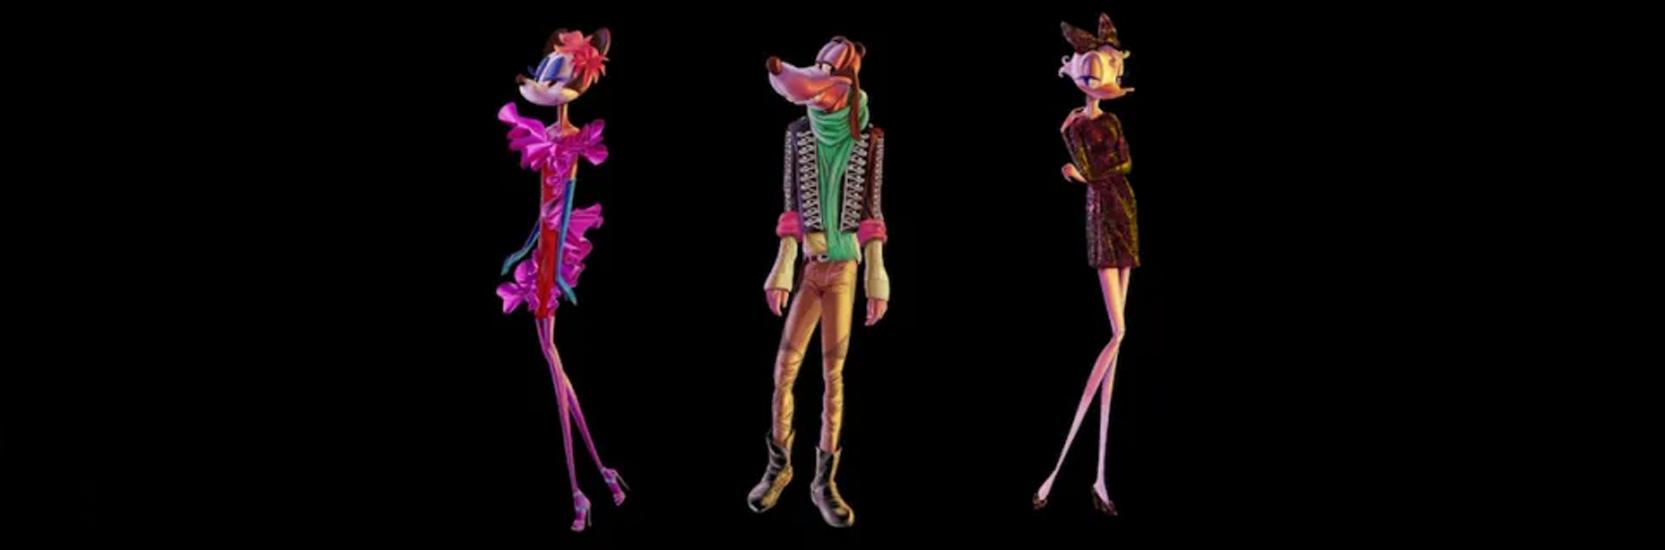 Disney, Barneys, Minnie et l'anorexie